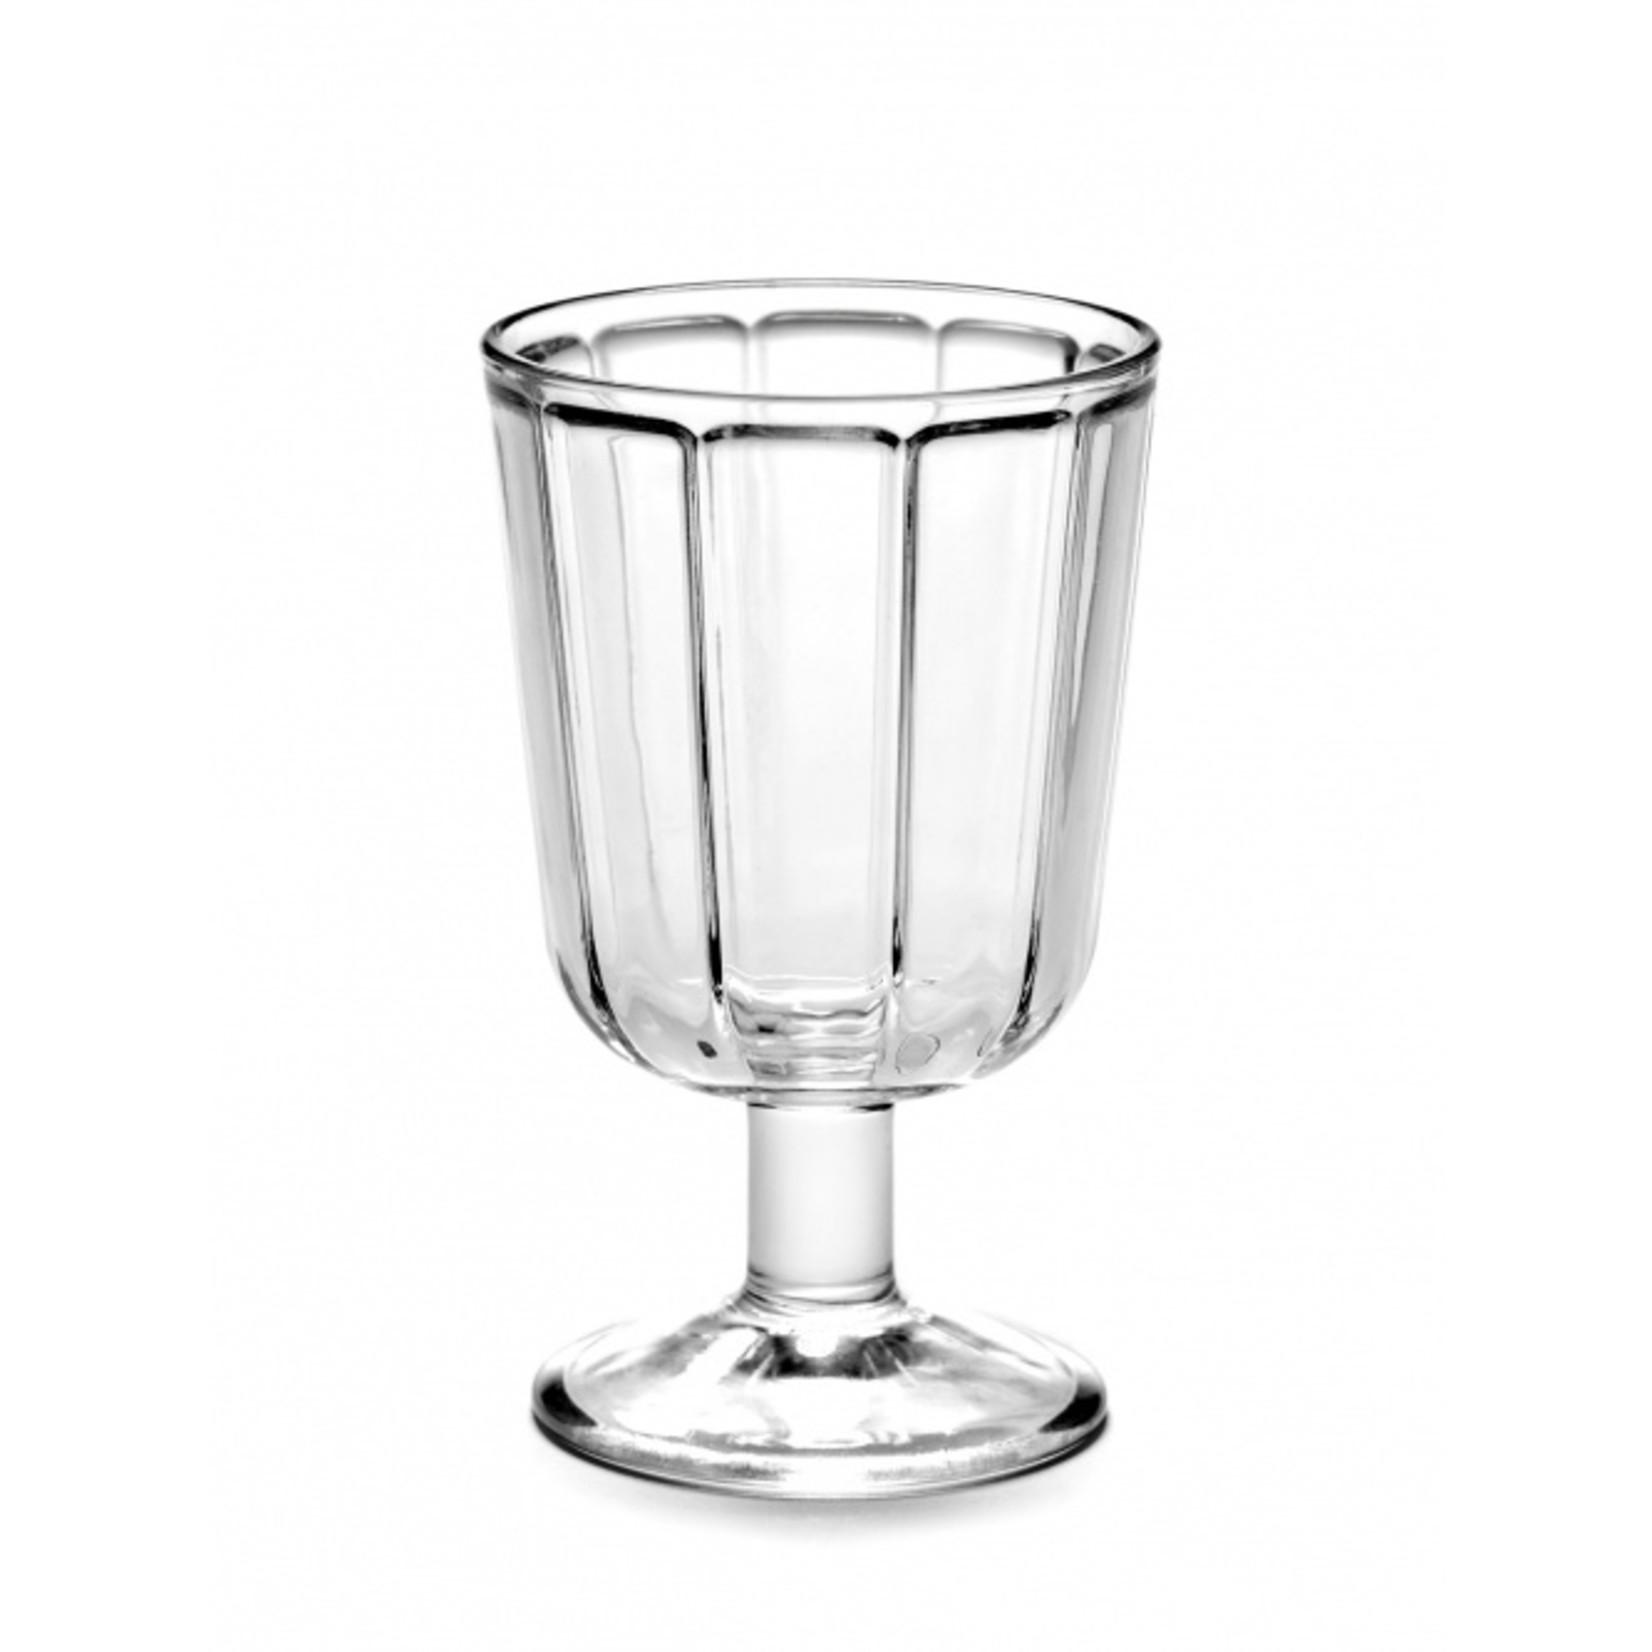 Sergio Herman Surface Wittewijn glas Surface